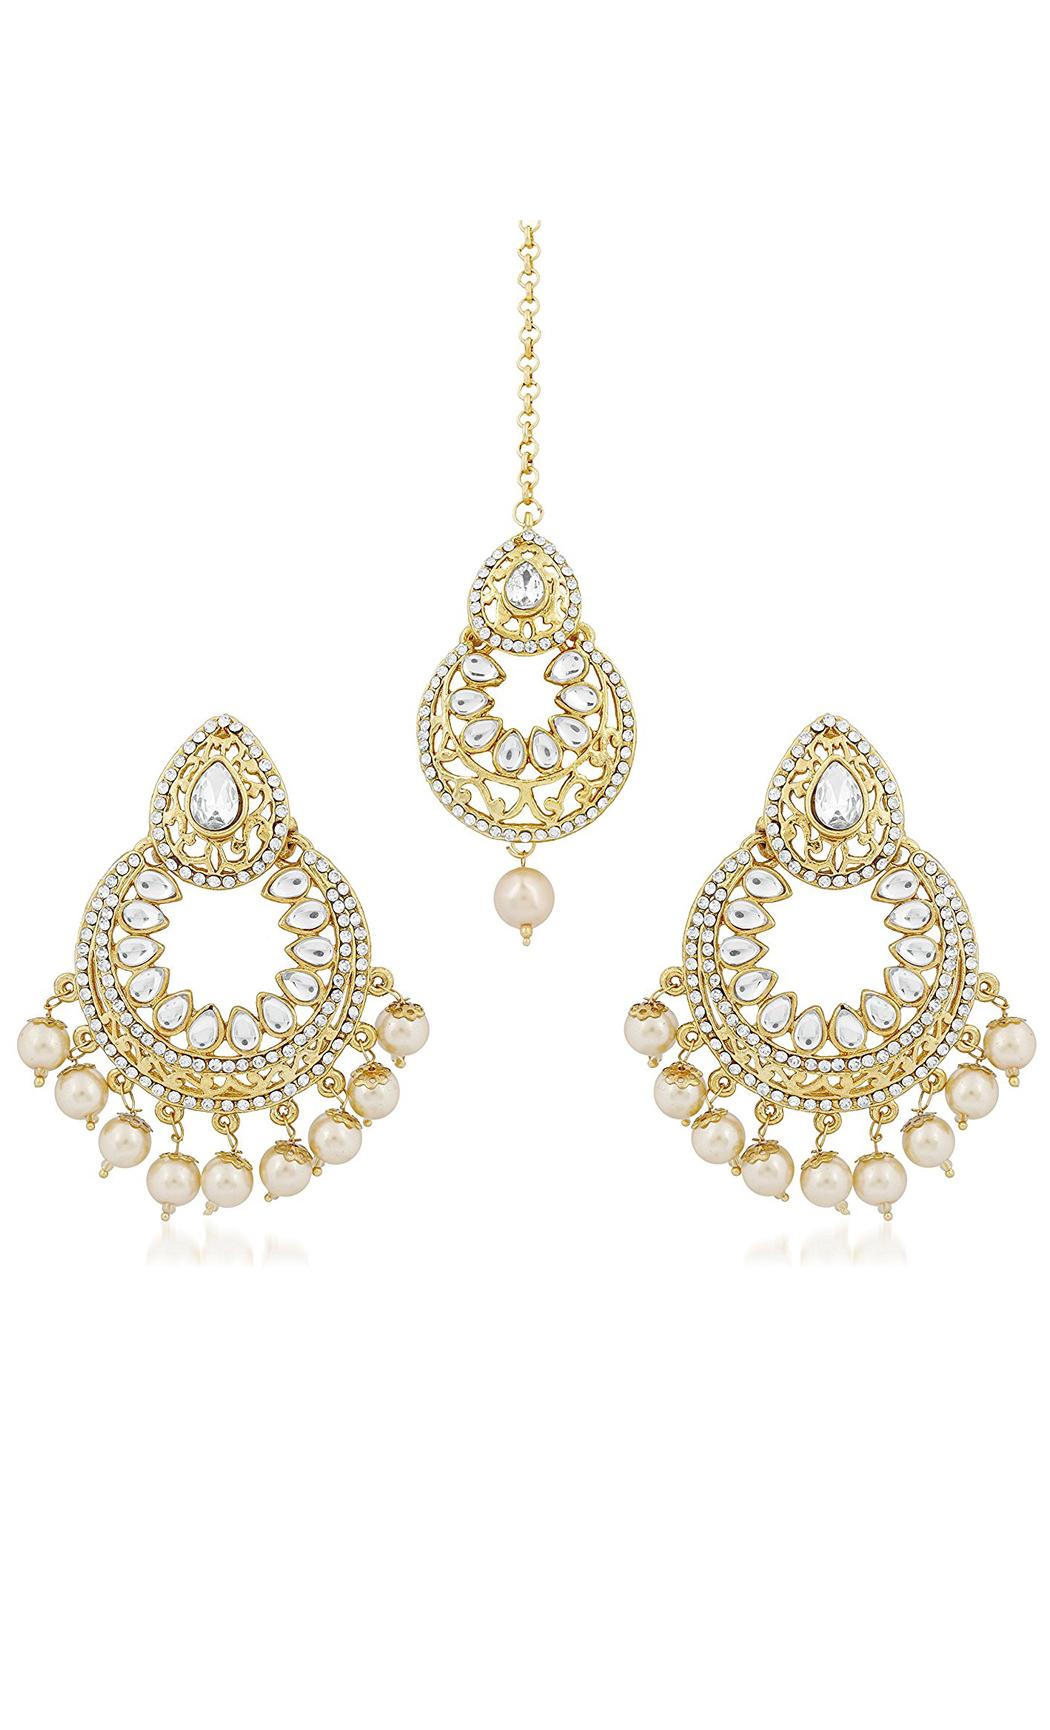 Kundan and Pearls Chandbalis Earrings & Mangtika Set - Shop Now